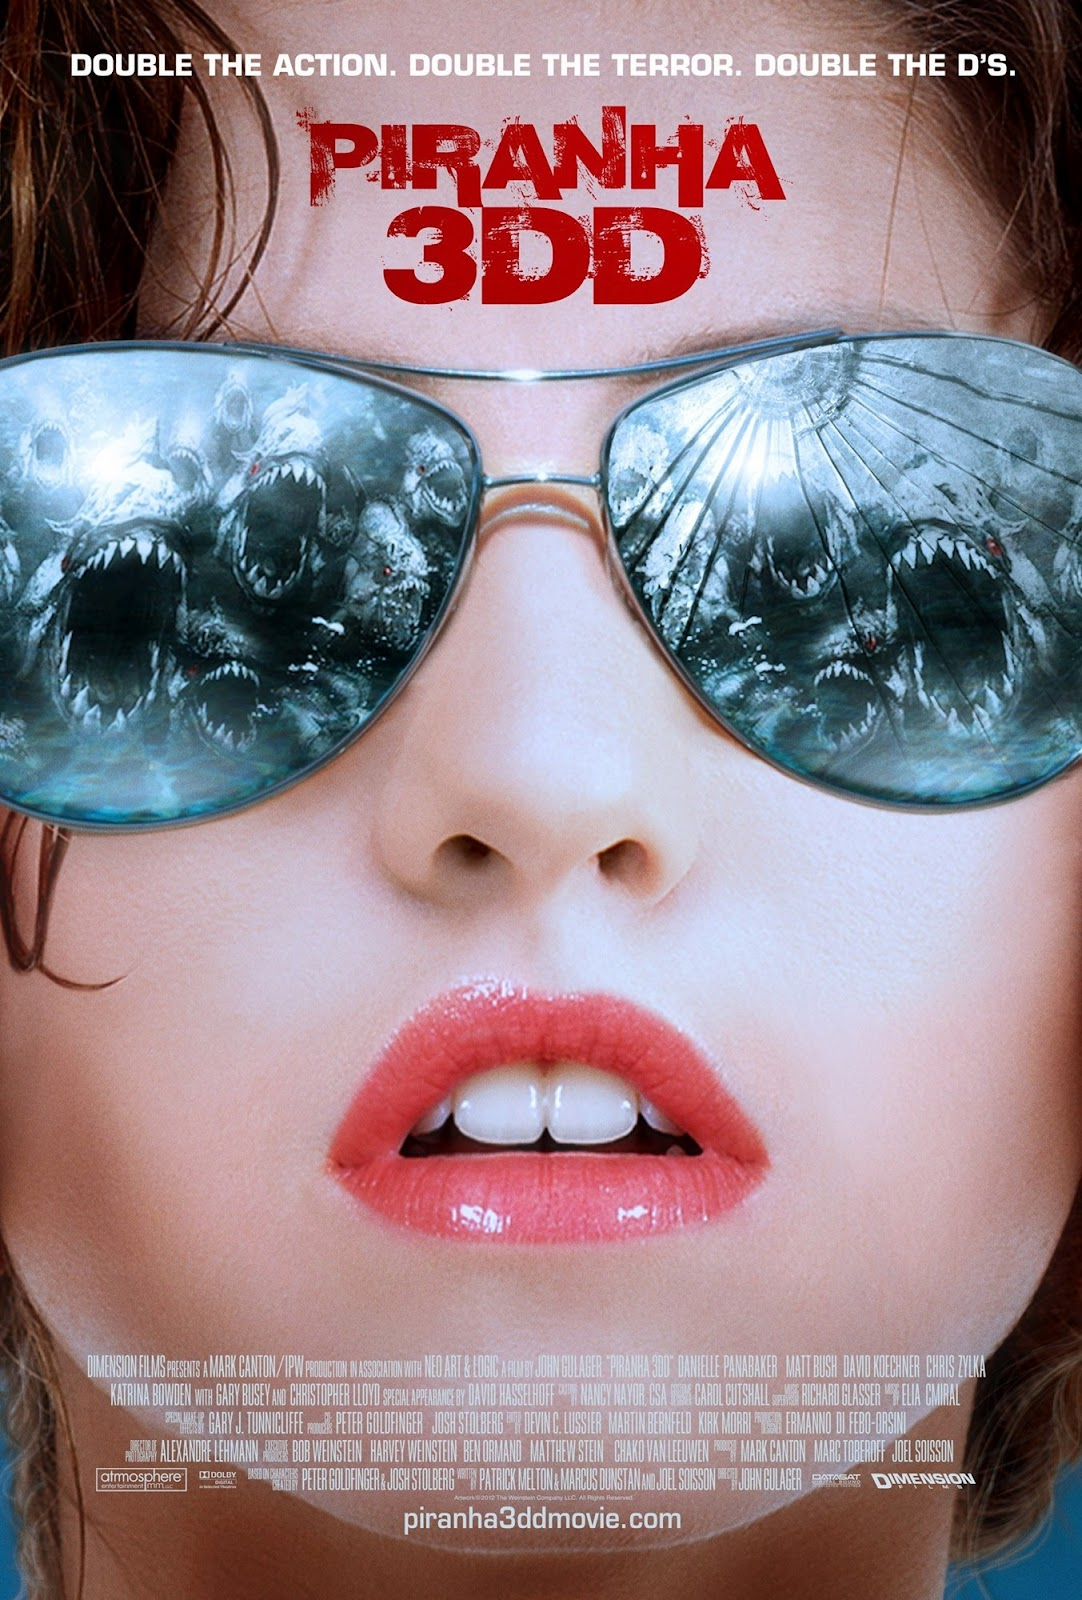 download free movies: free download - piranha 3dd (2012) english